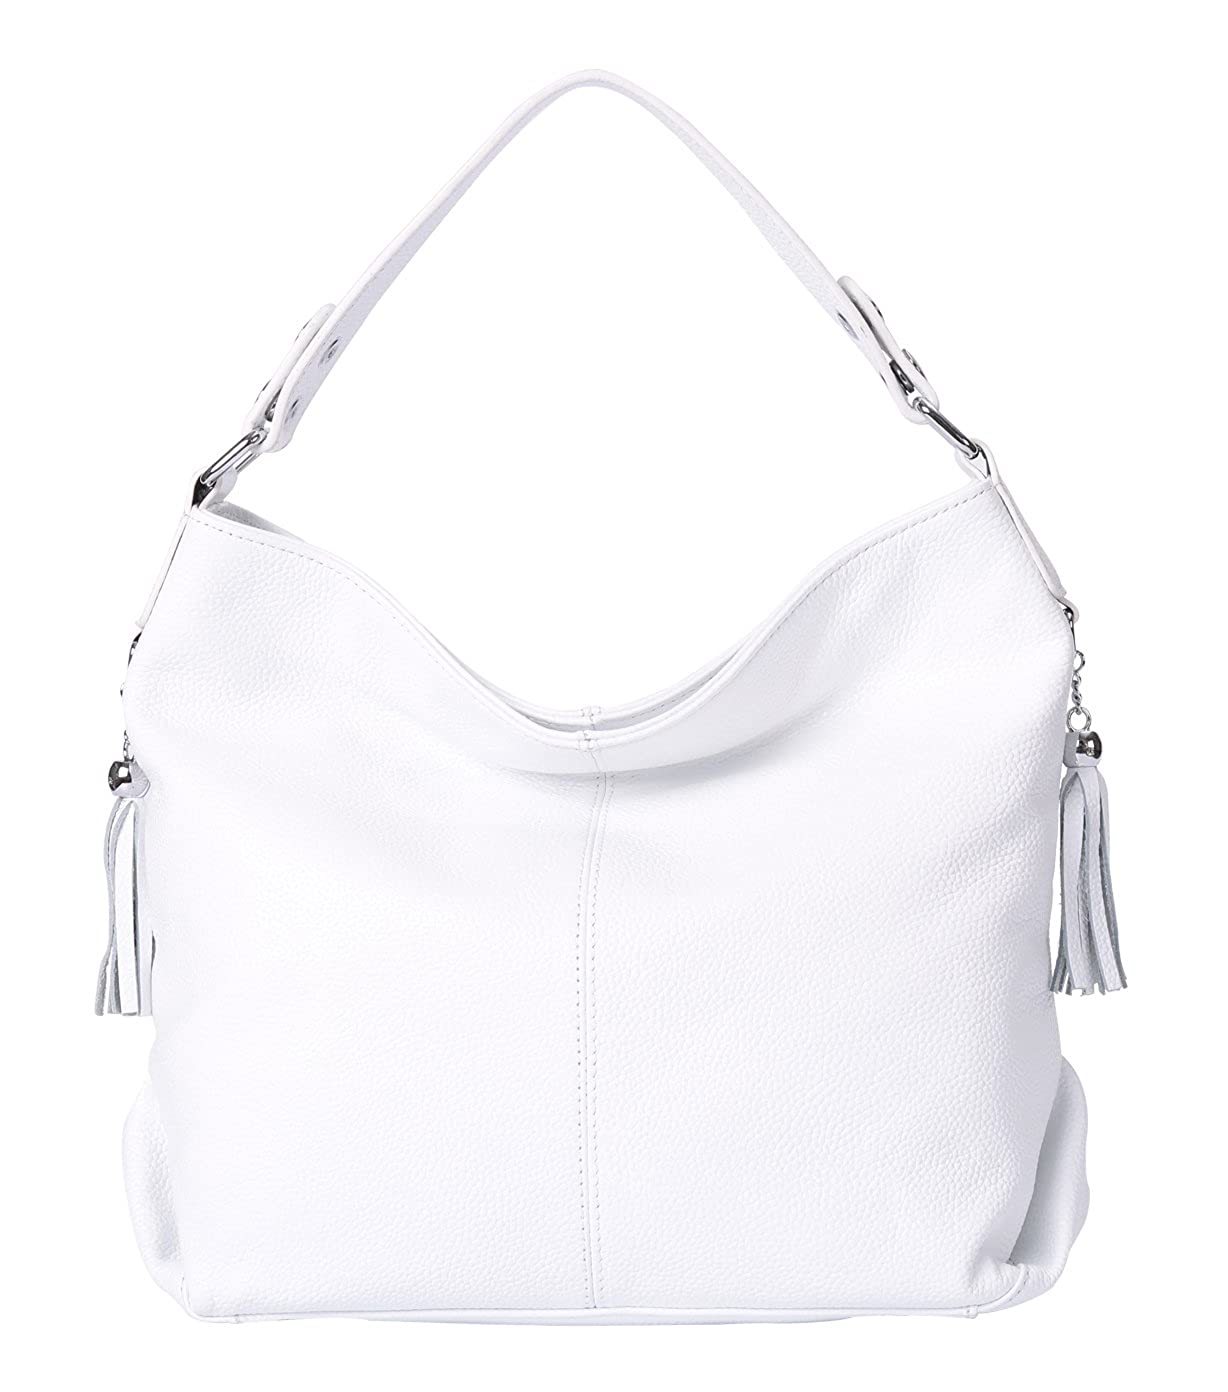 e75cdcc0493783 Amazon.com: BIG SALE-AINIMOER Womens Leather Vintage Shoulder Bag Ladies  Handbags Large Tote Top-handle Purse Cross Body Bags(White): AINIMOER US